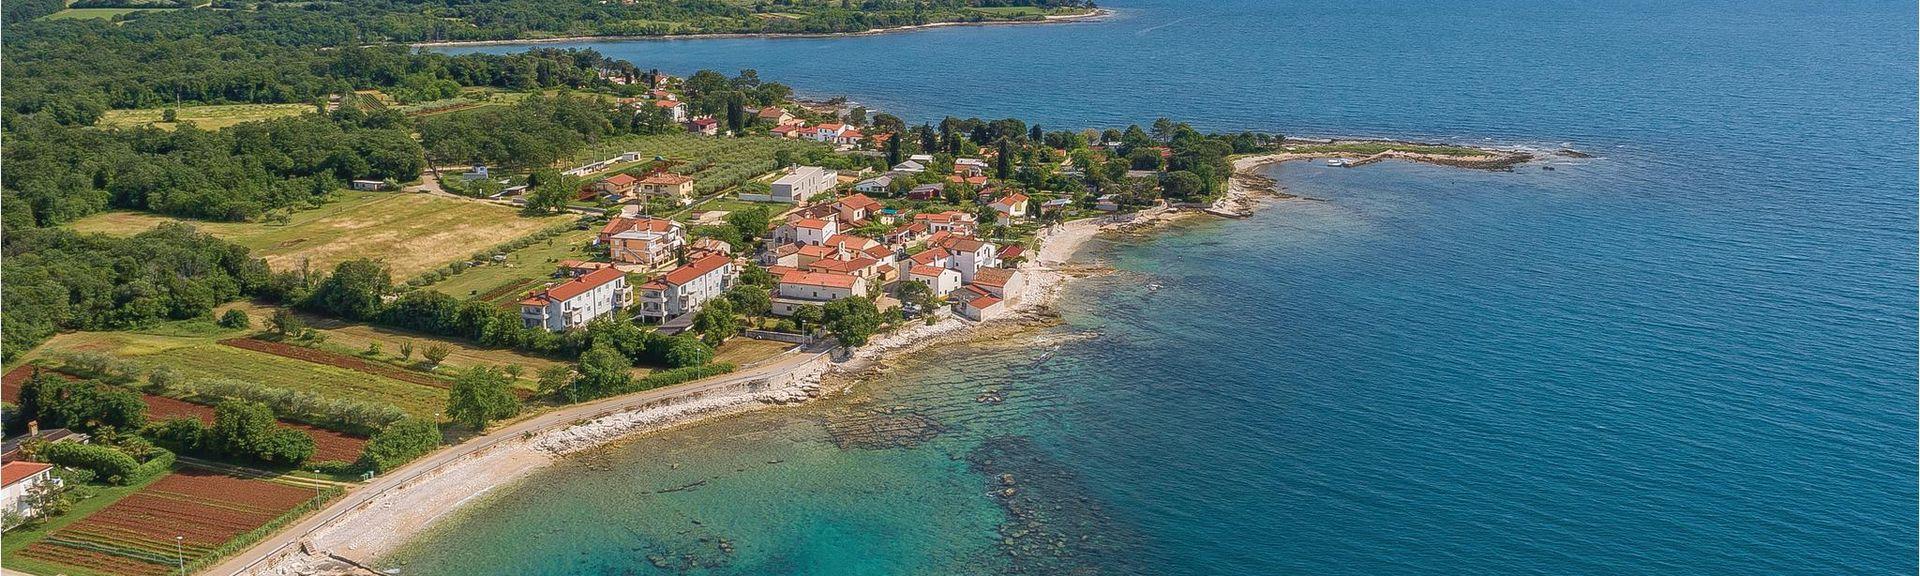 Savudrija, Gespanschaft Istrien, Kroatien